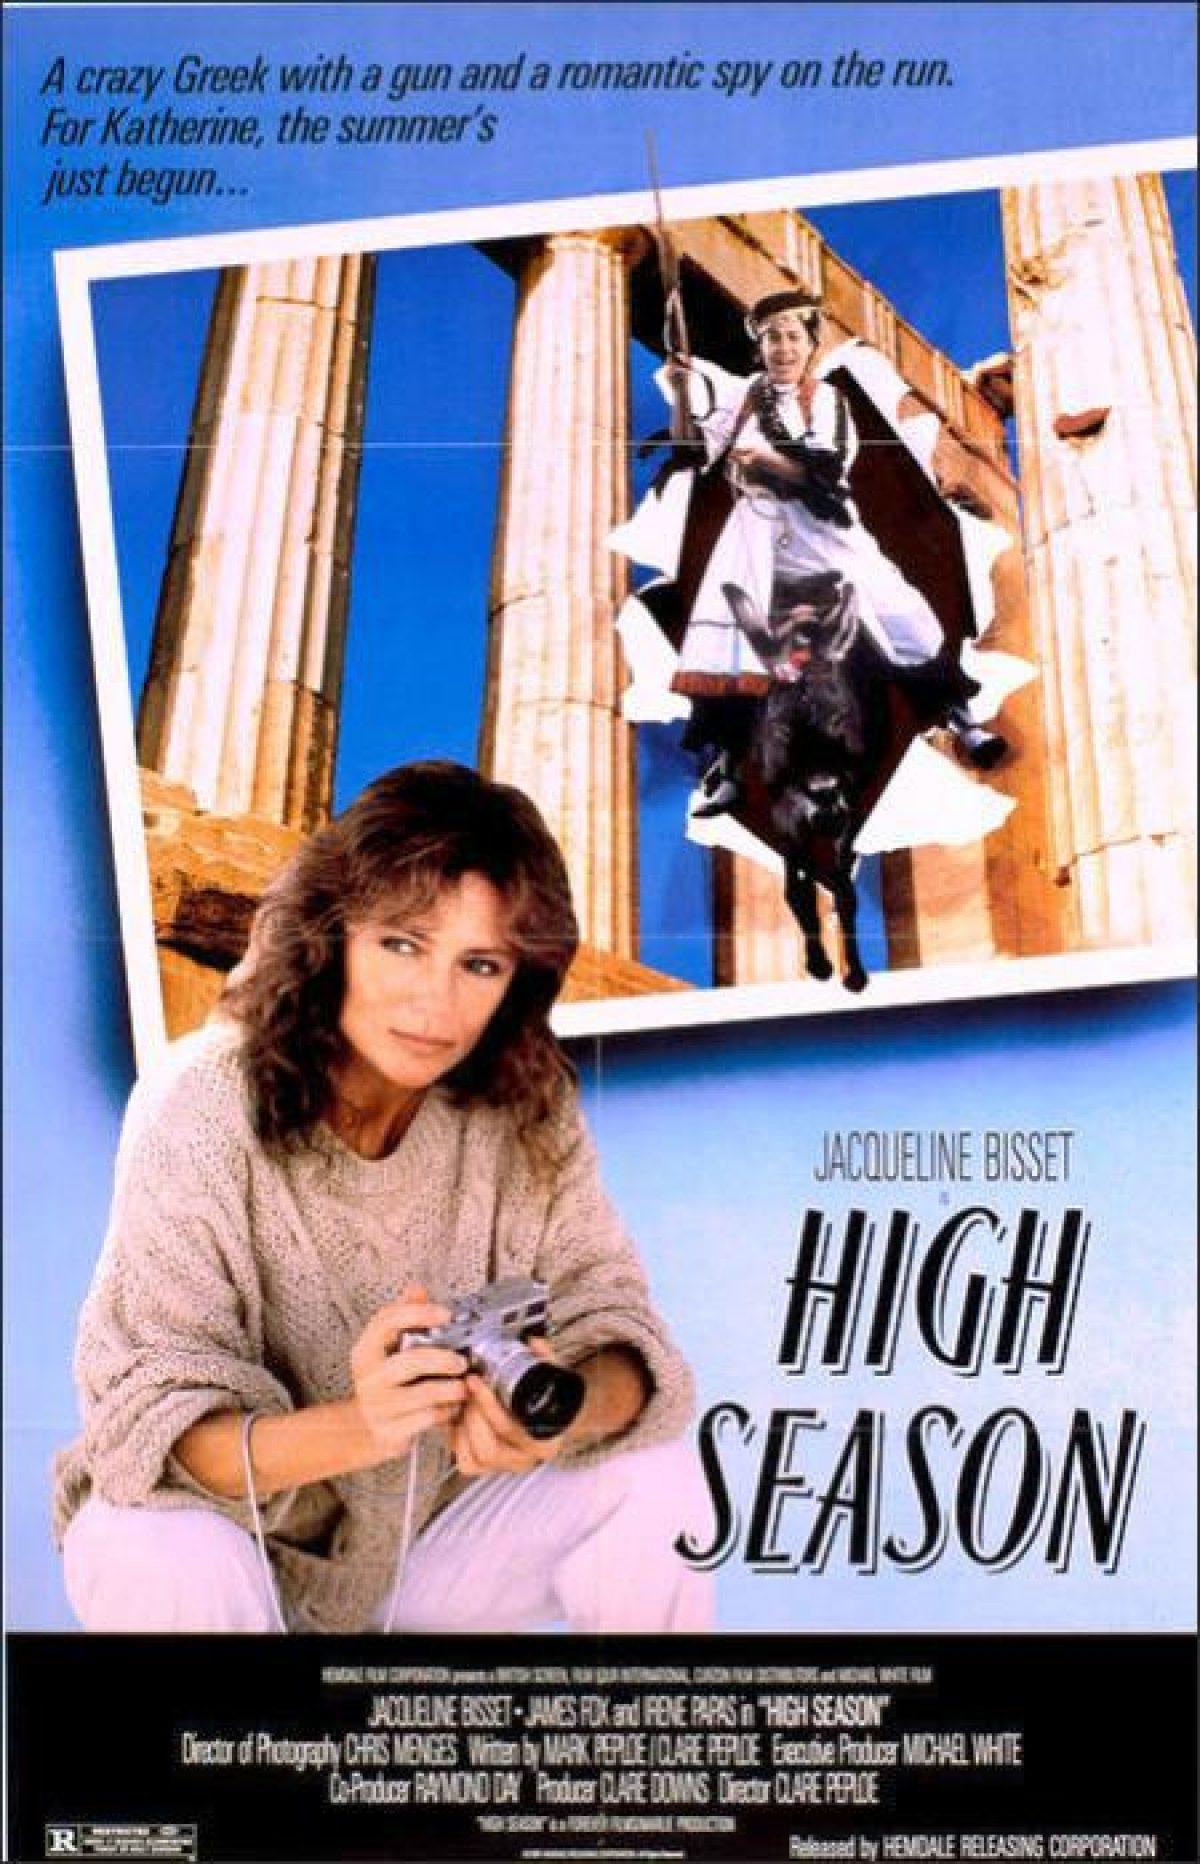 High Season (1988) Poster #1